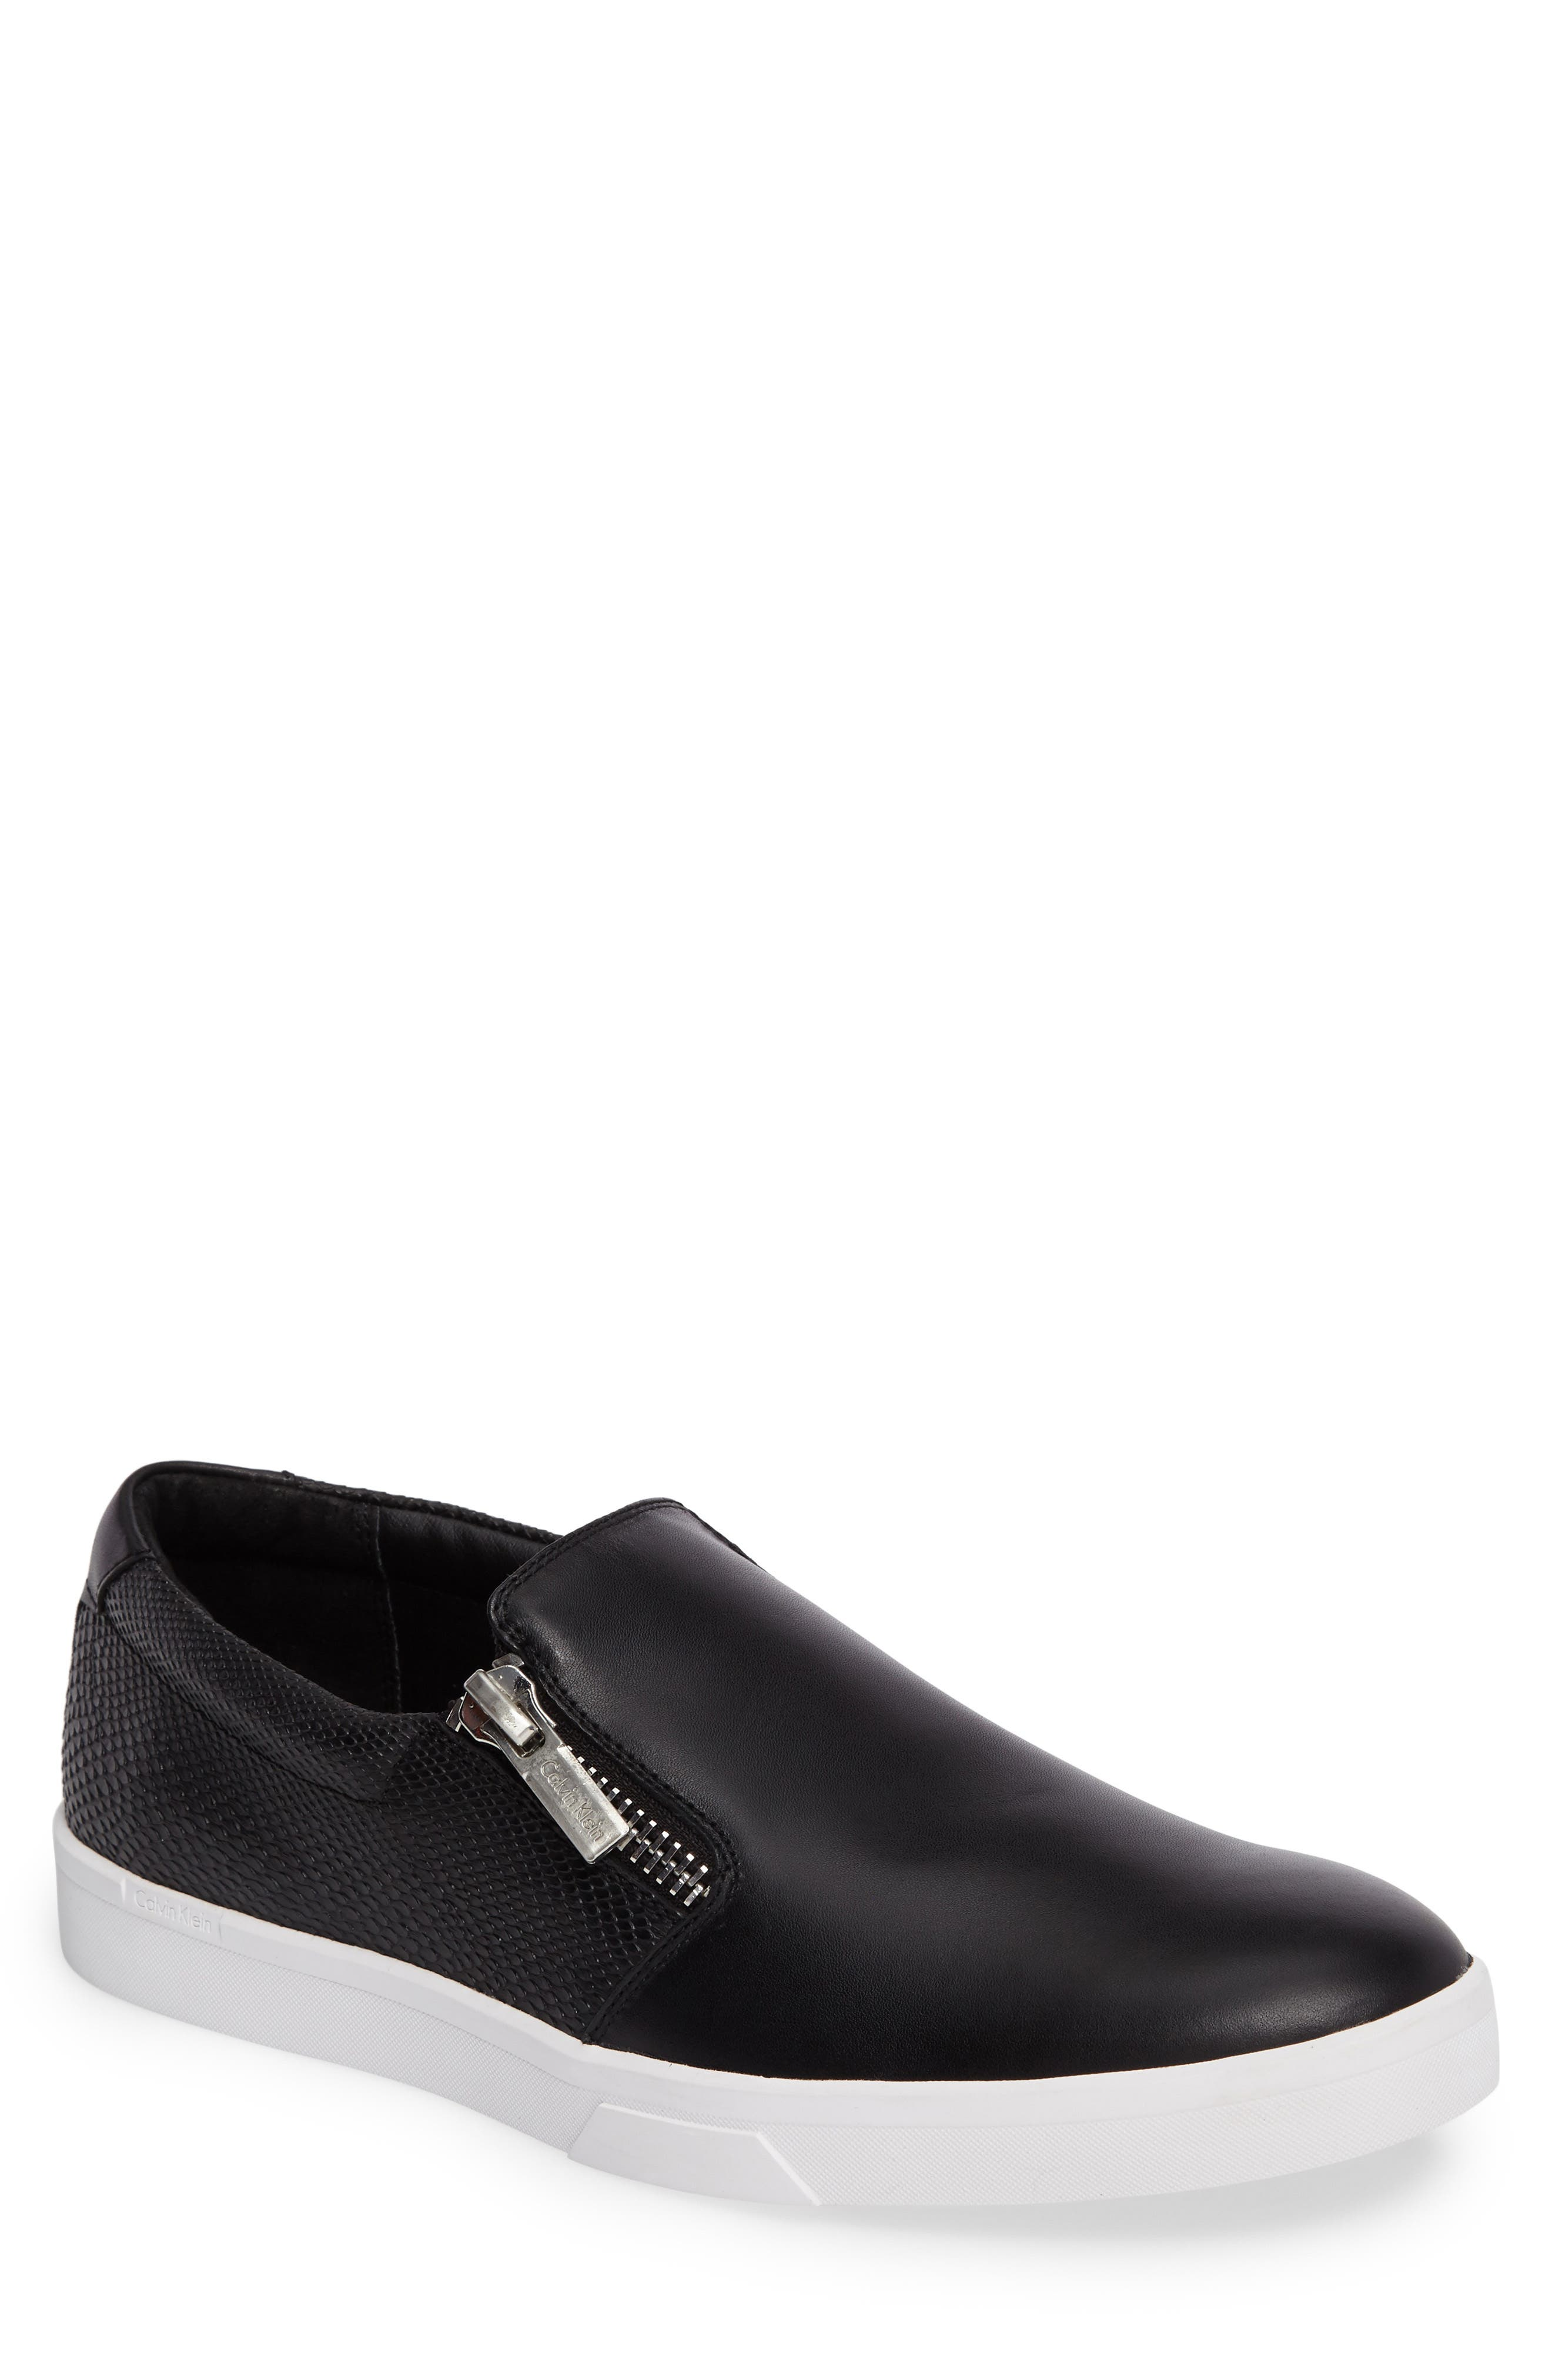 Ibiza Slip-On Zip Sneaker,                             Main thumbnail 1, color,                             Black Leather